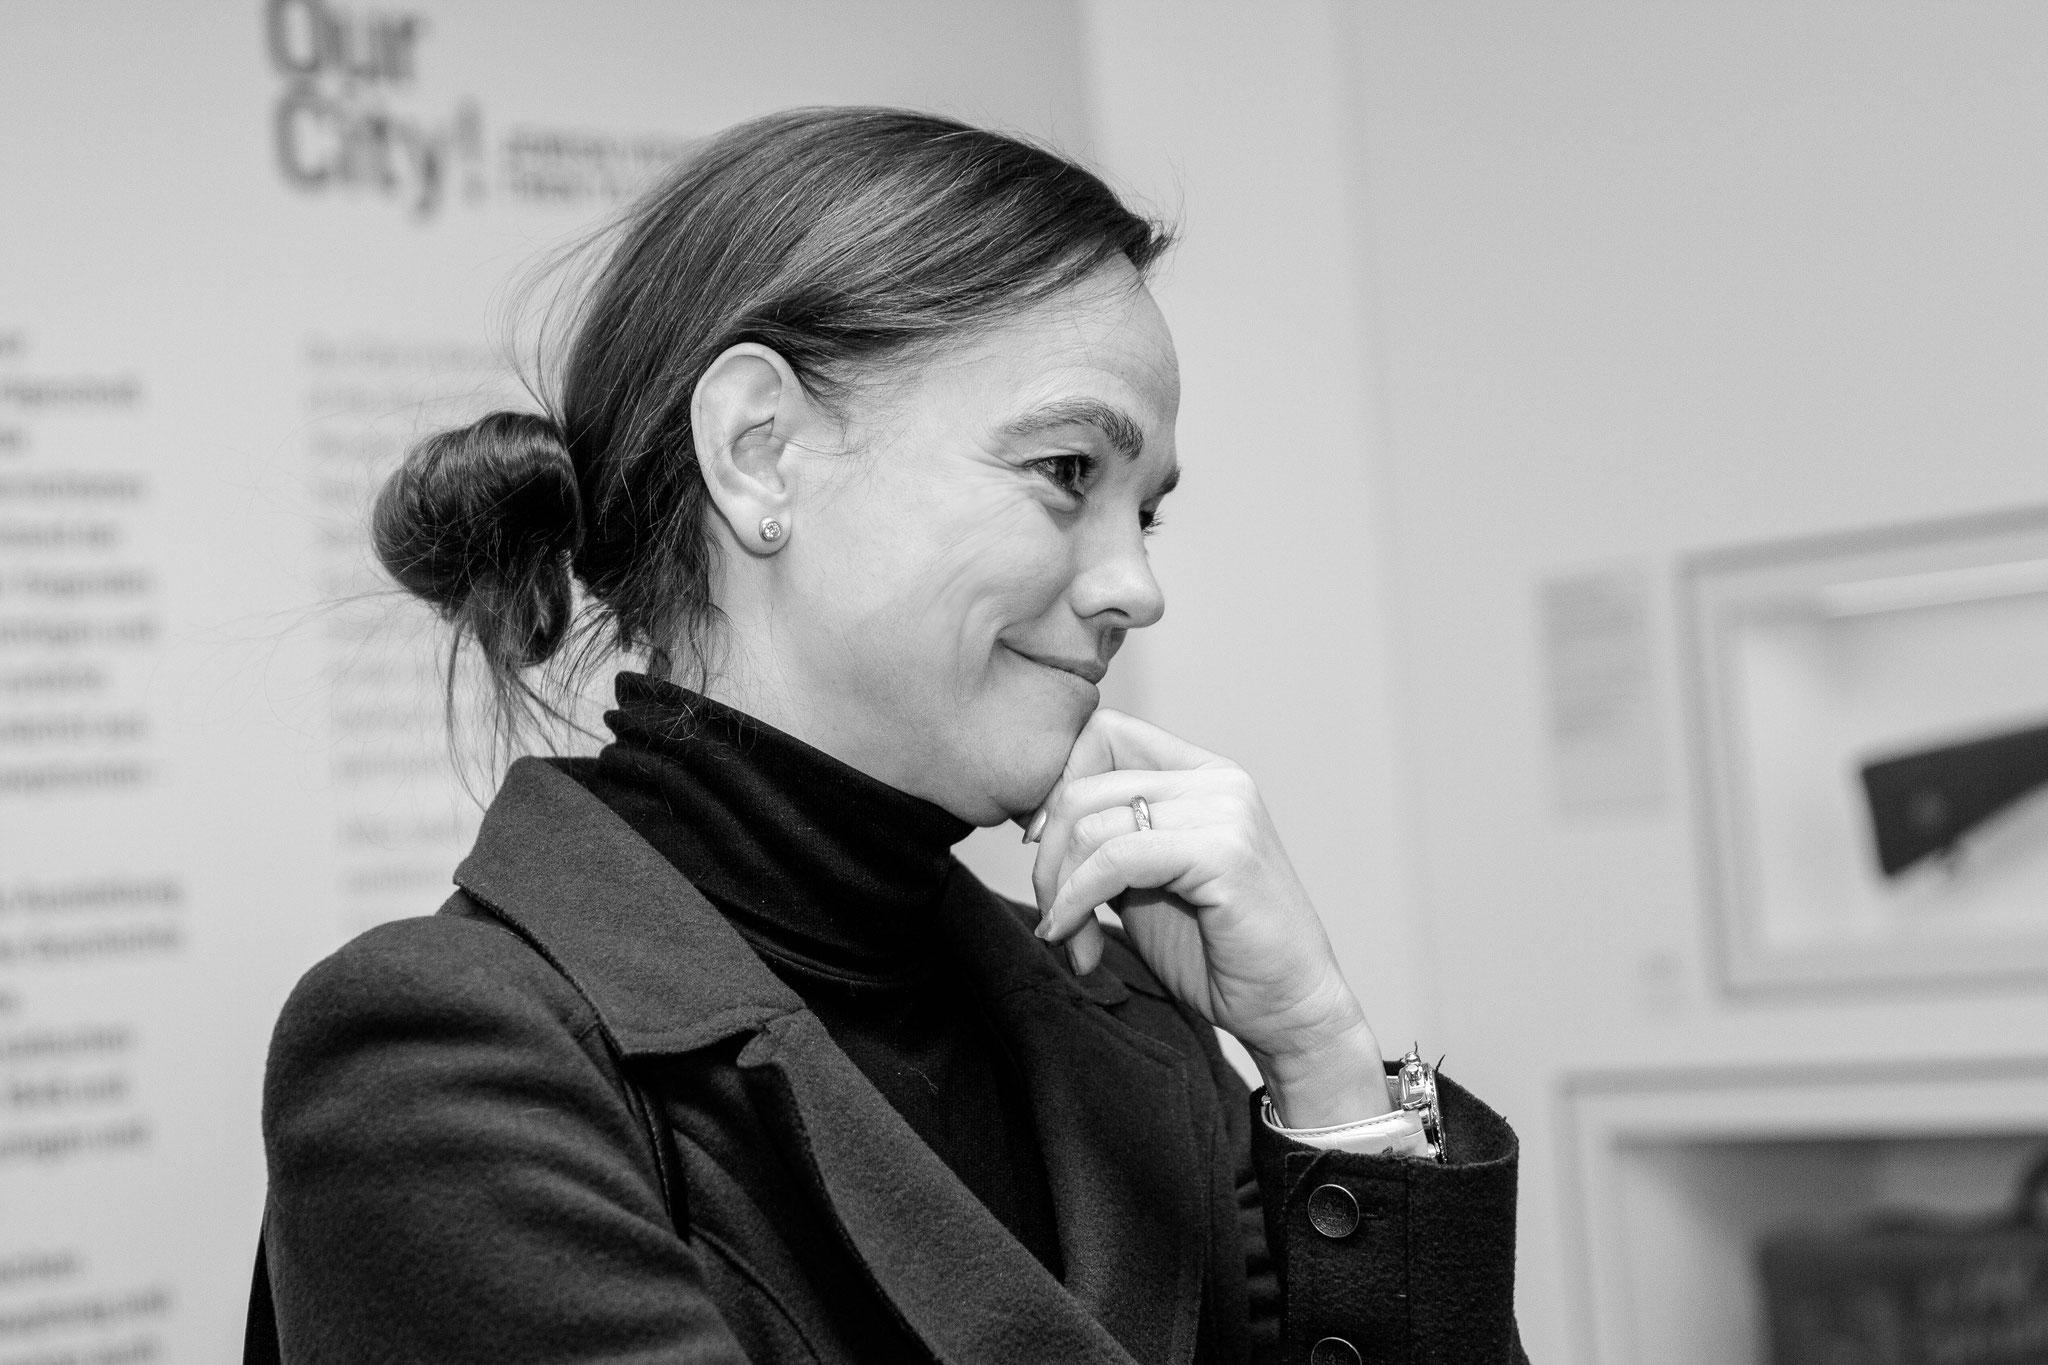 BM Sonja Hammerschmid